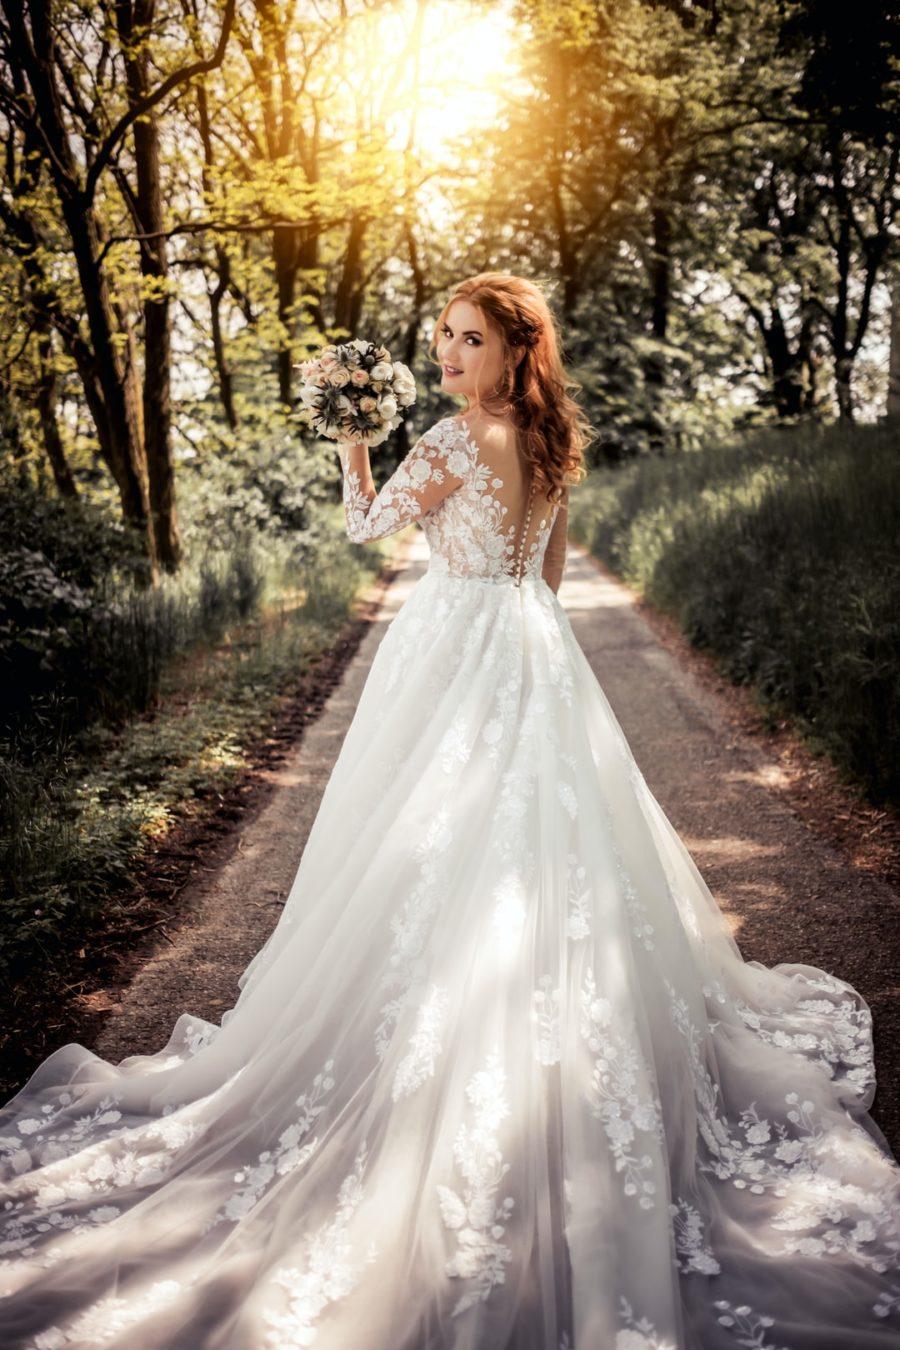 robe mariée blanche histoire